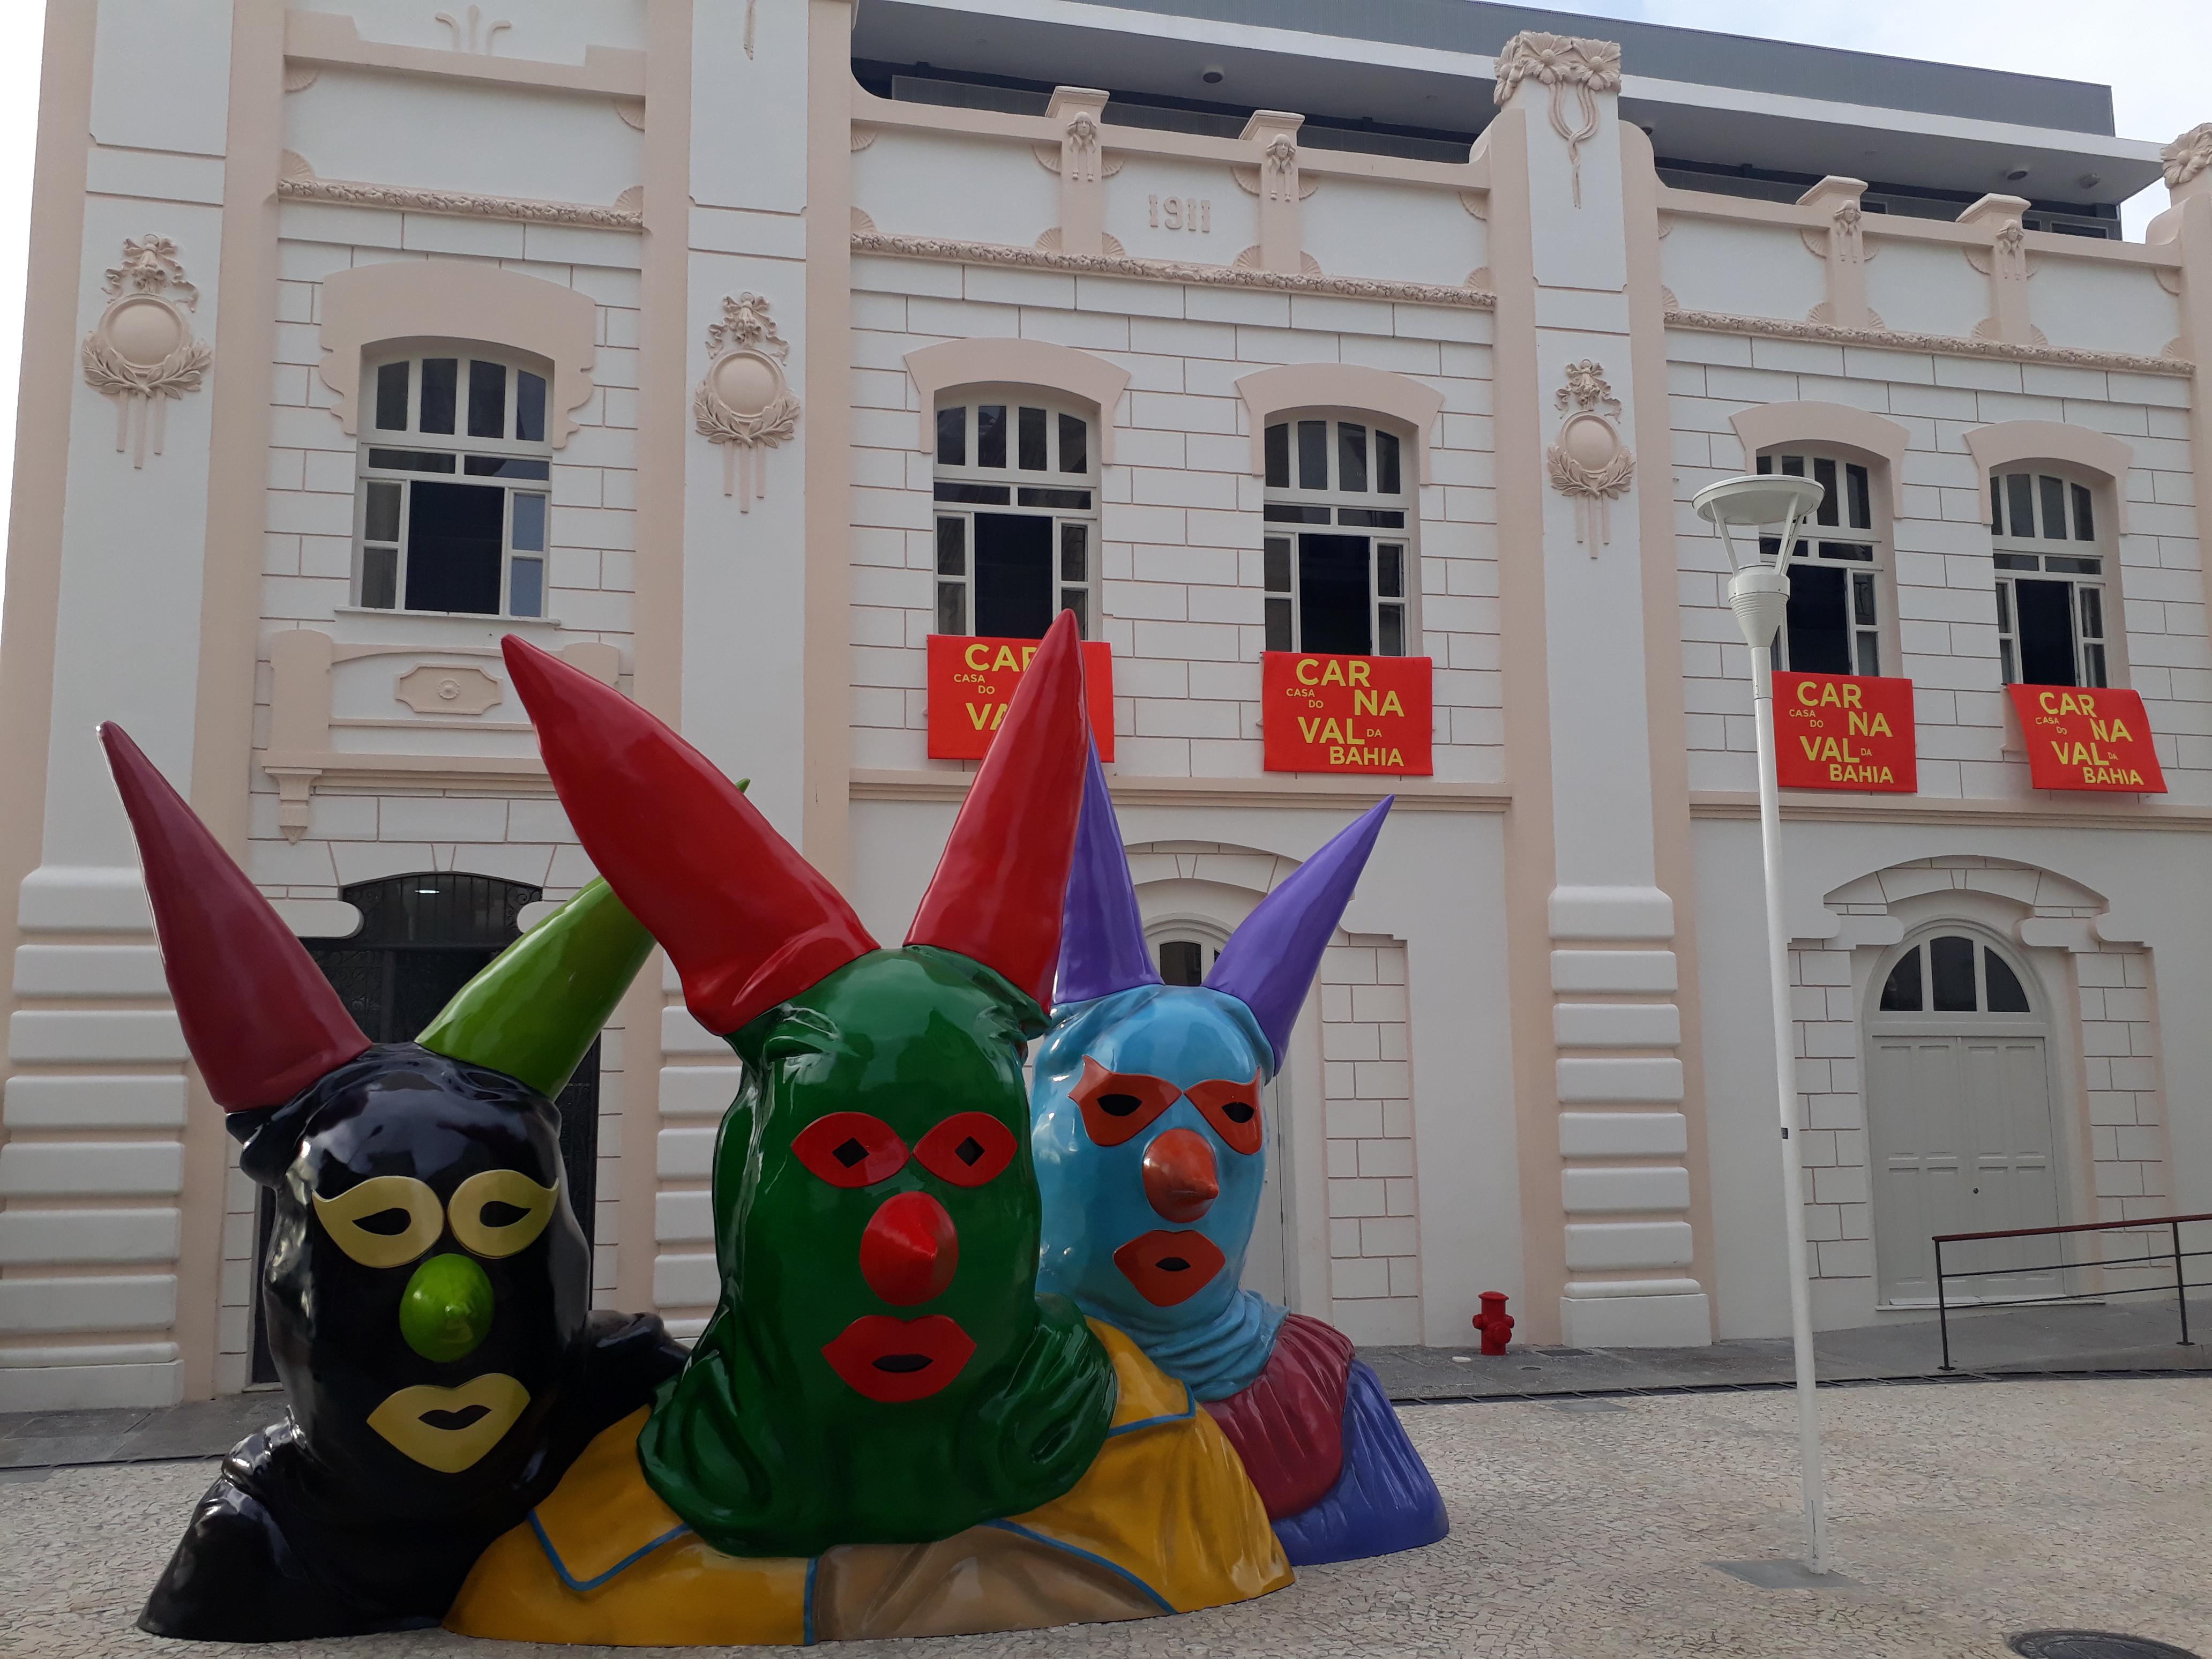 Casa do Carnaval da Bahia | Sinttel Bahia